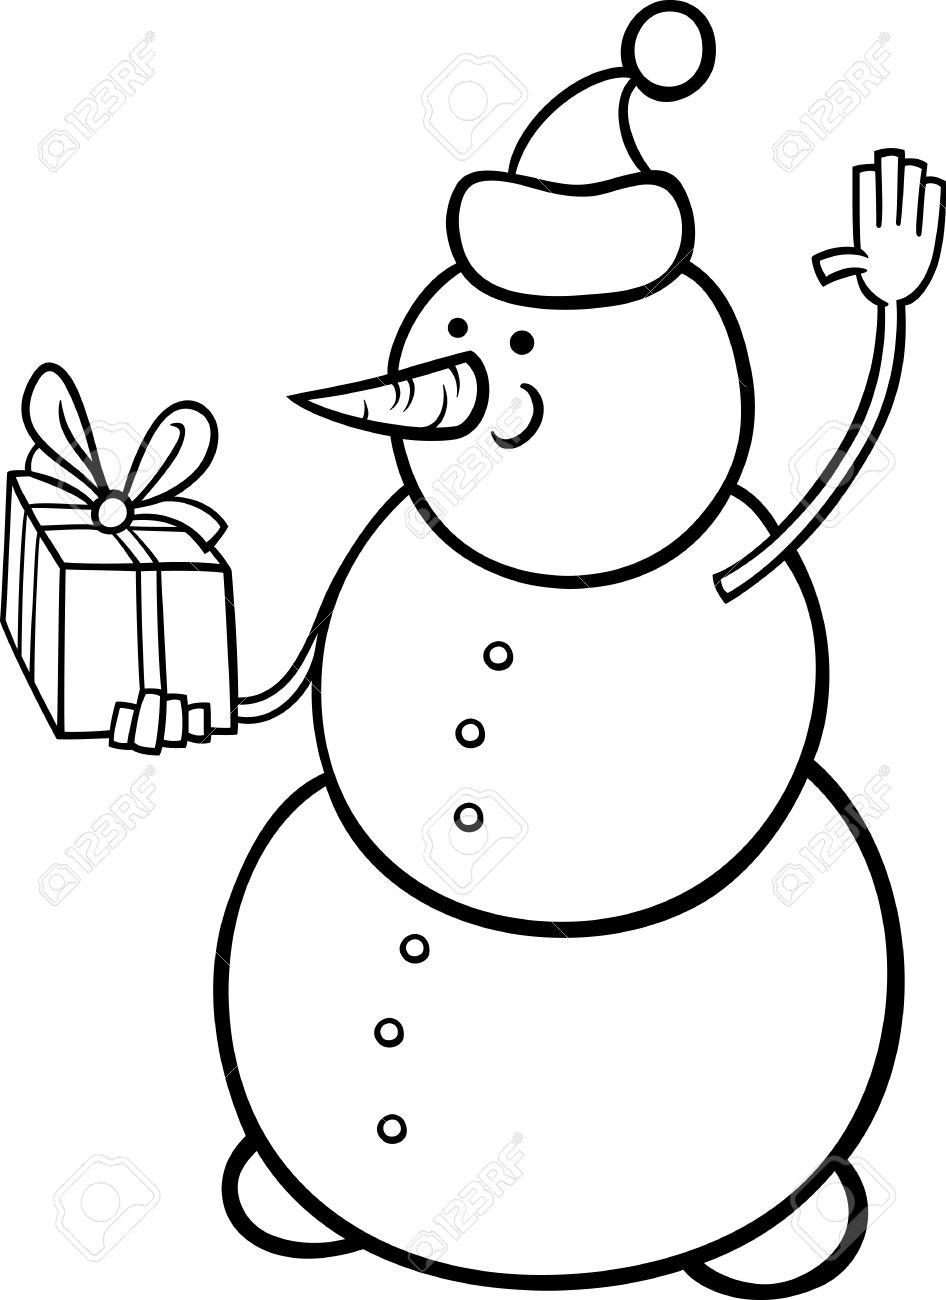 black and white cartoon illustration of snowman as santa claus